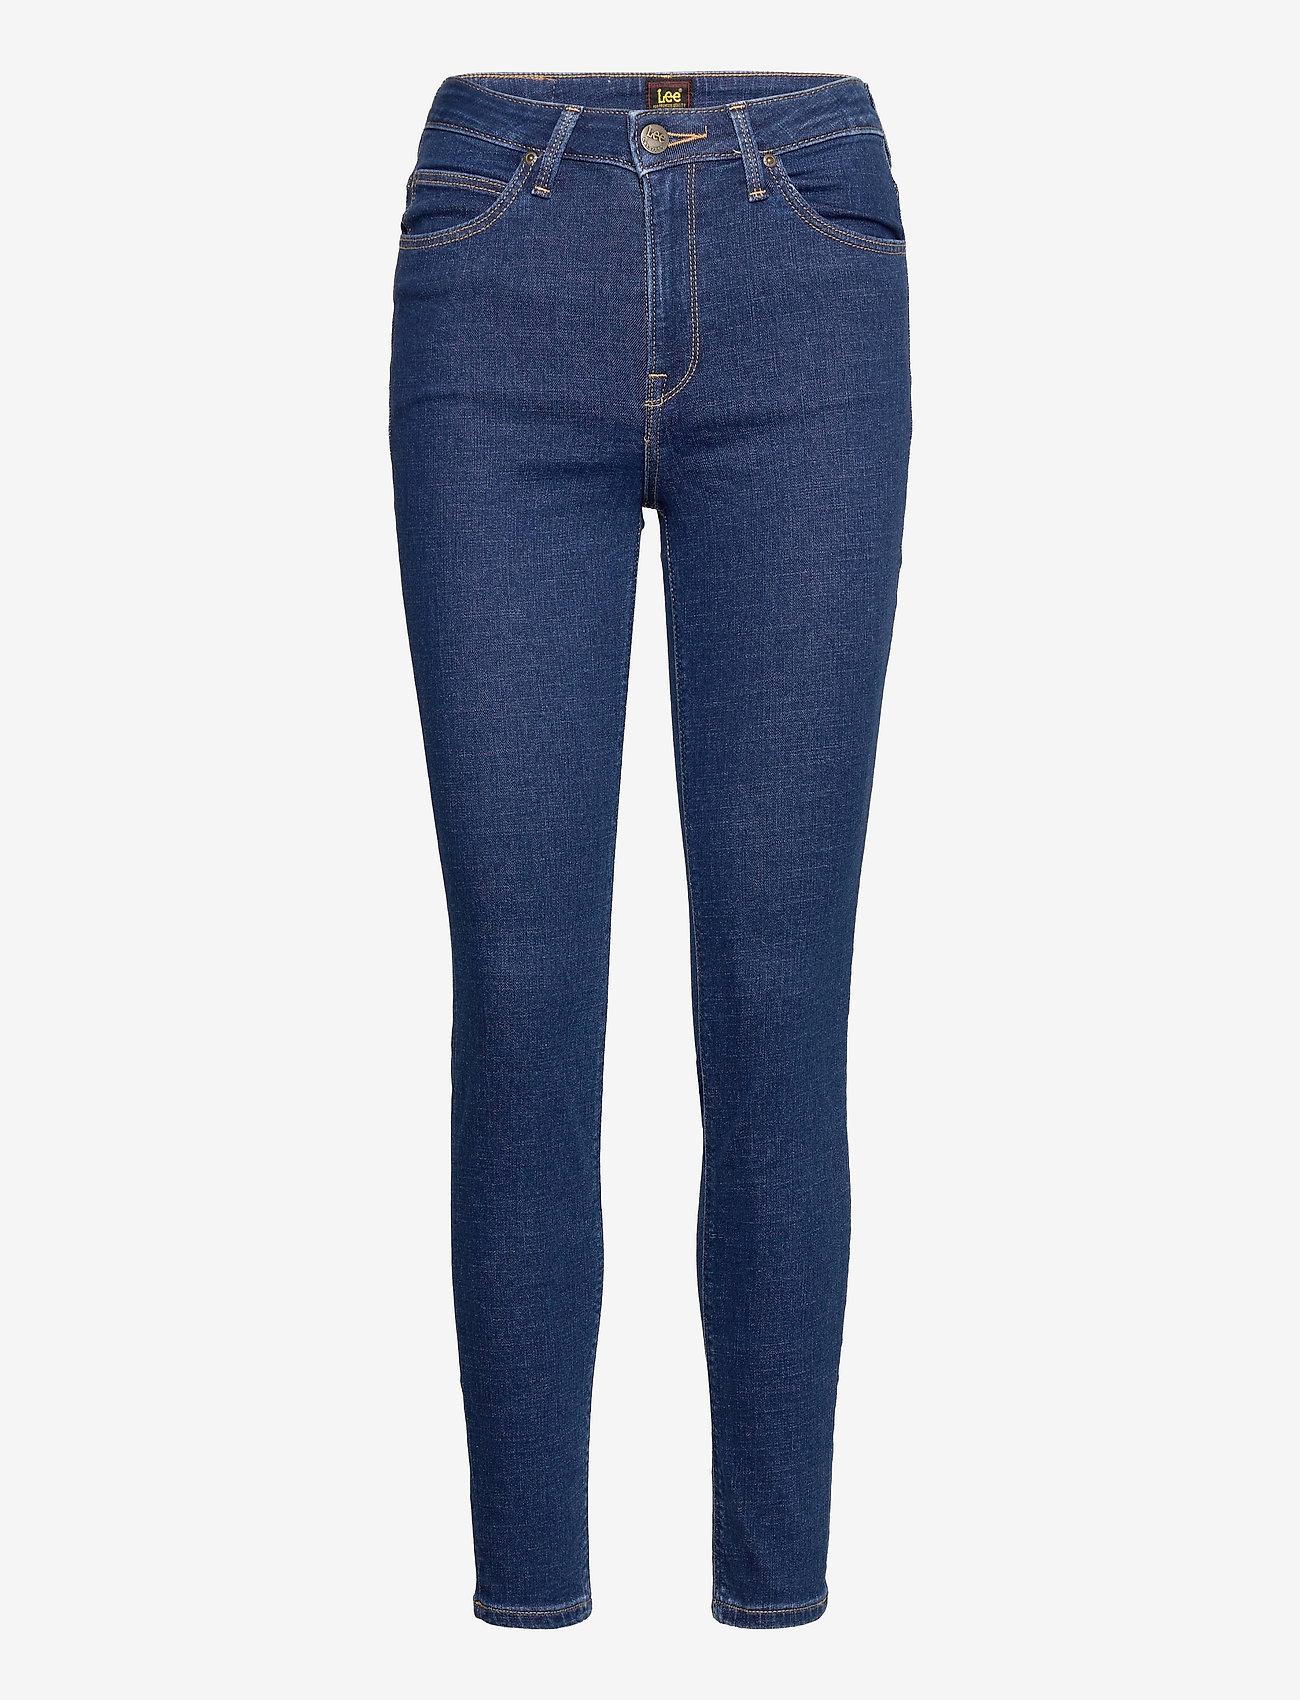 Lee Jeans - SCARLETT HIGH - skinny jeans - dark mono - 0